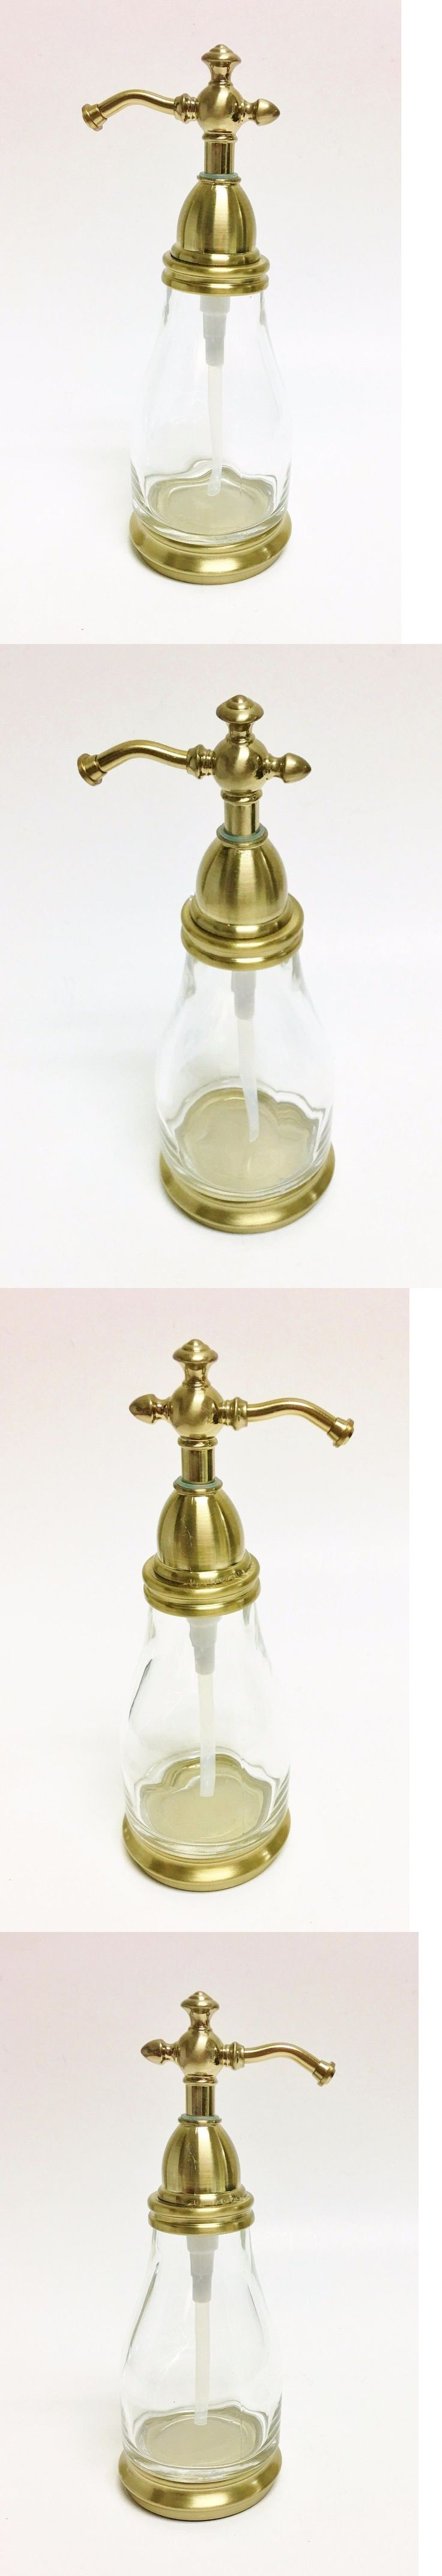 Top 25 Best Kitchen Soap Dispenser Ideas On Pinterest